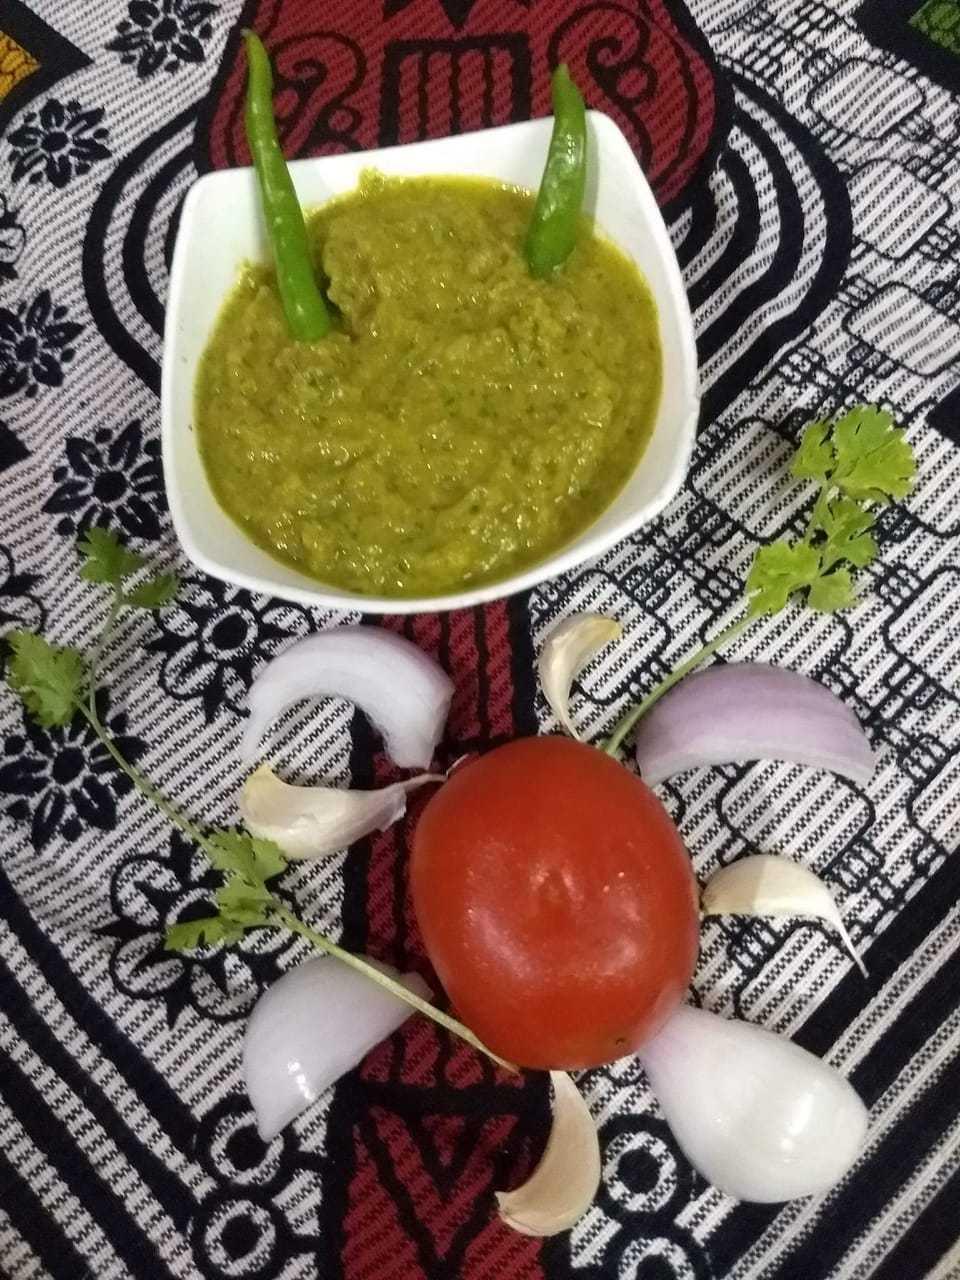 Tomato Onion Garlic Dip